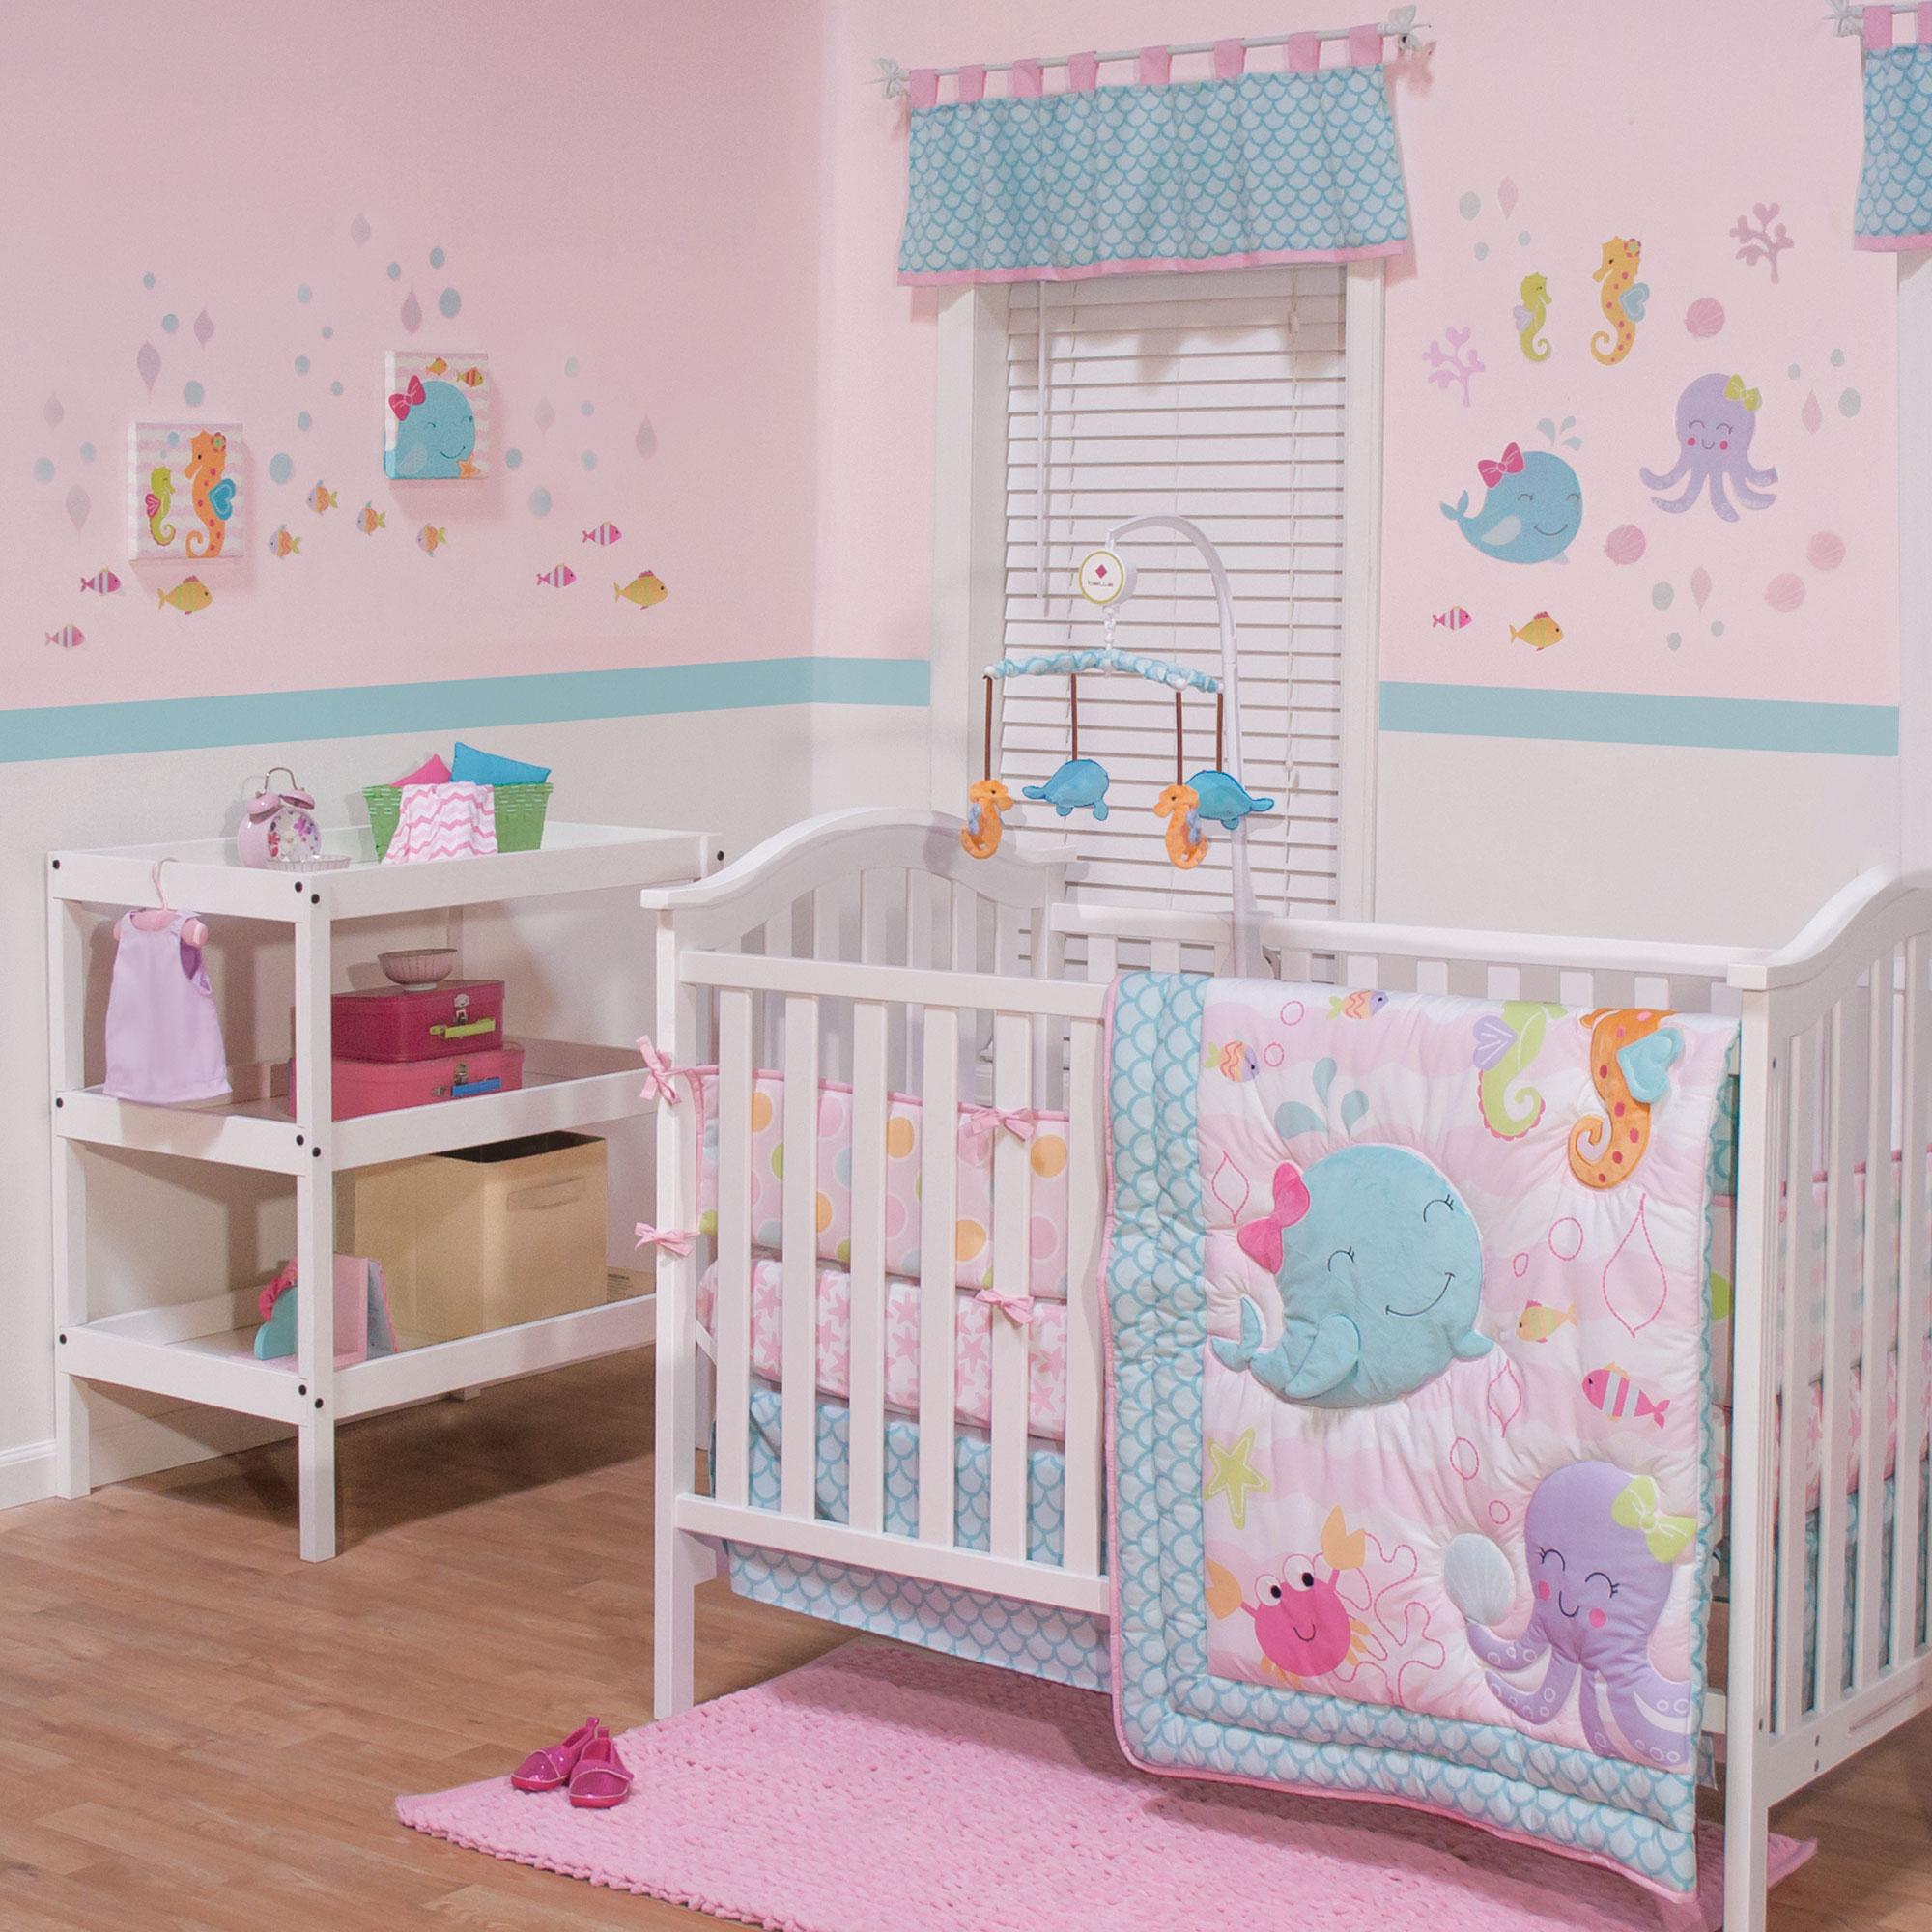 Belle Sea Sweetie 3 Piece Crib Bedding Set Model 24448714